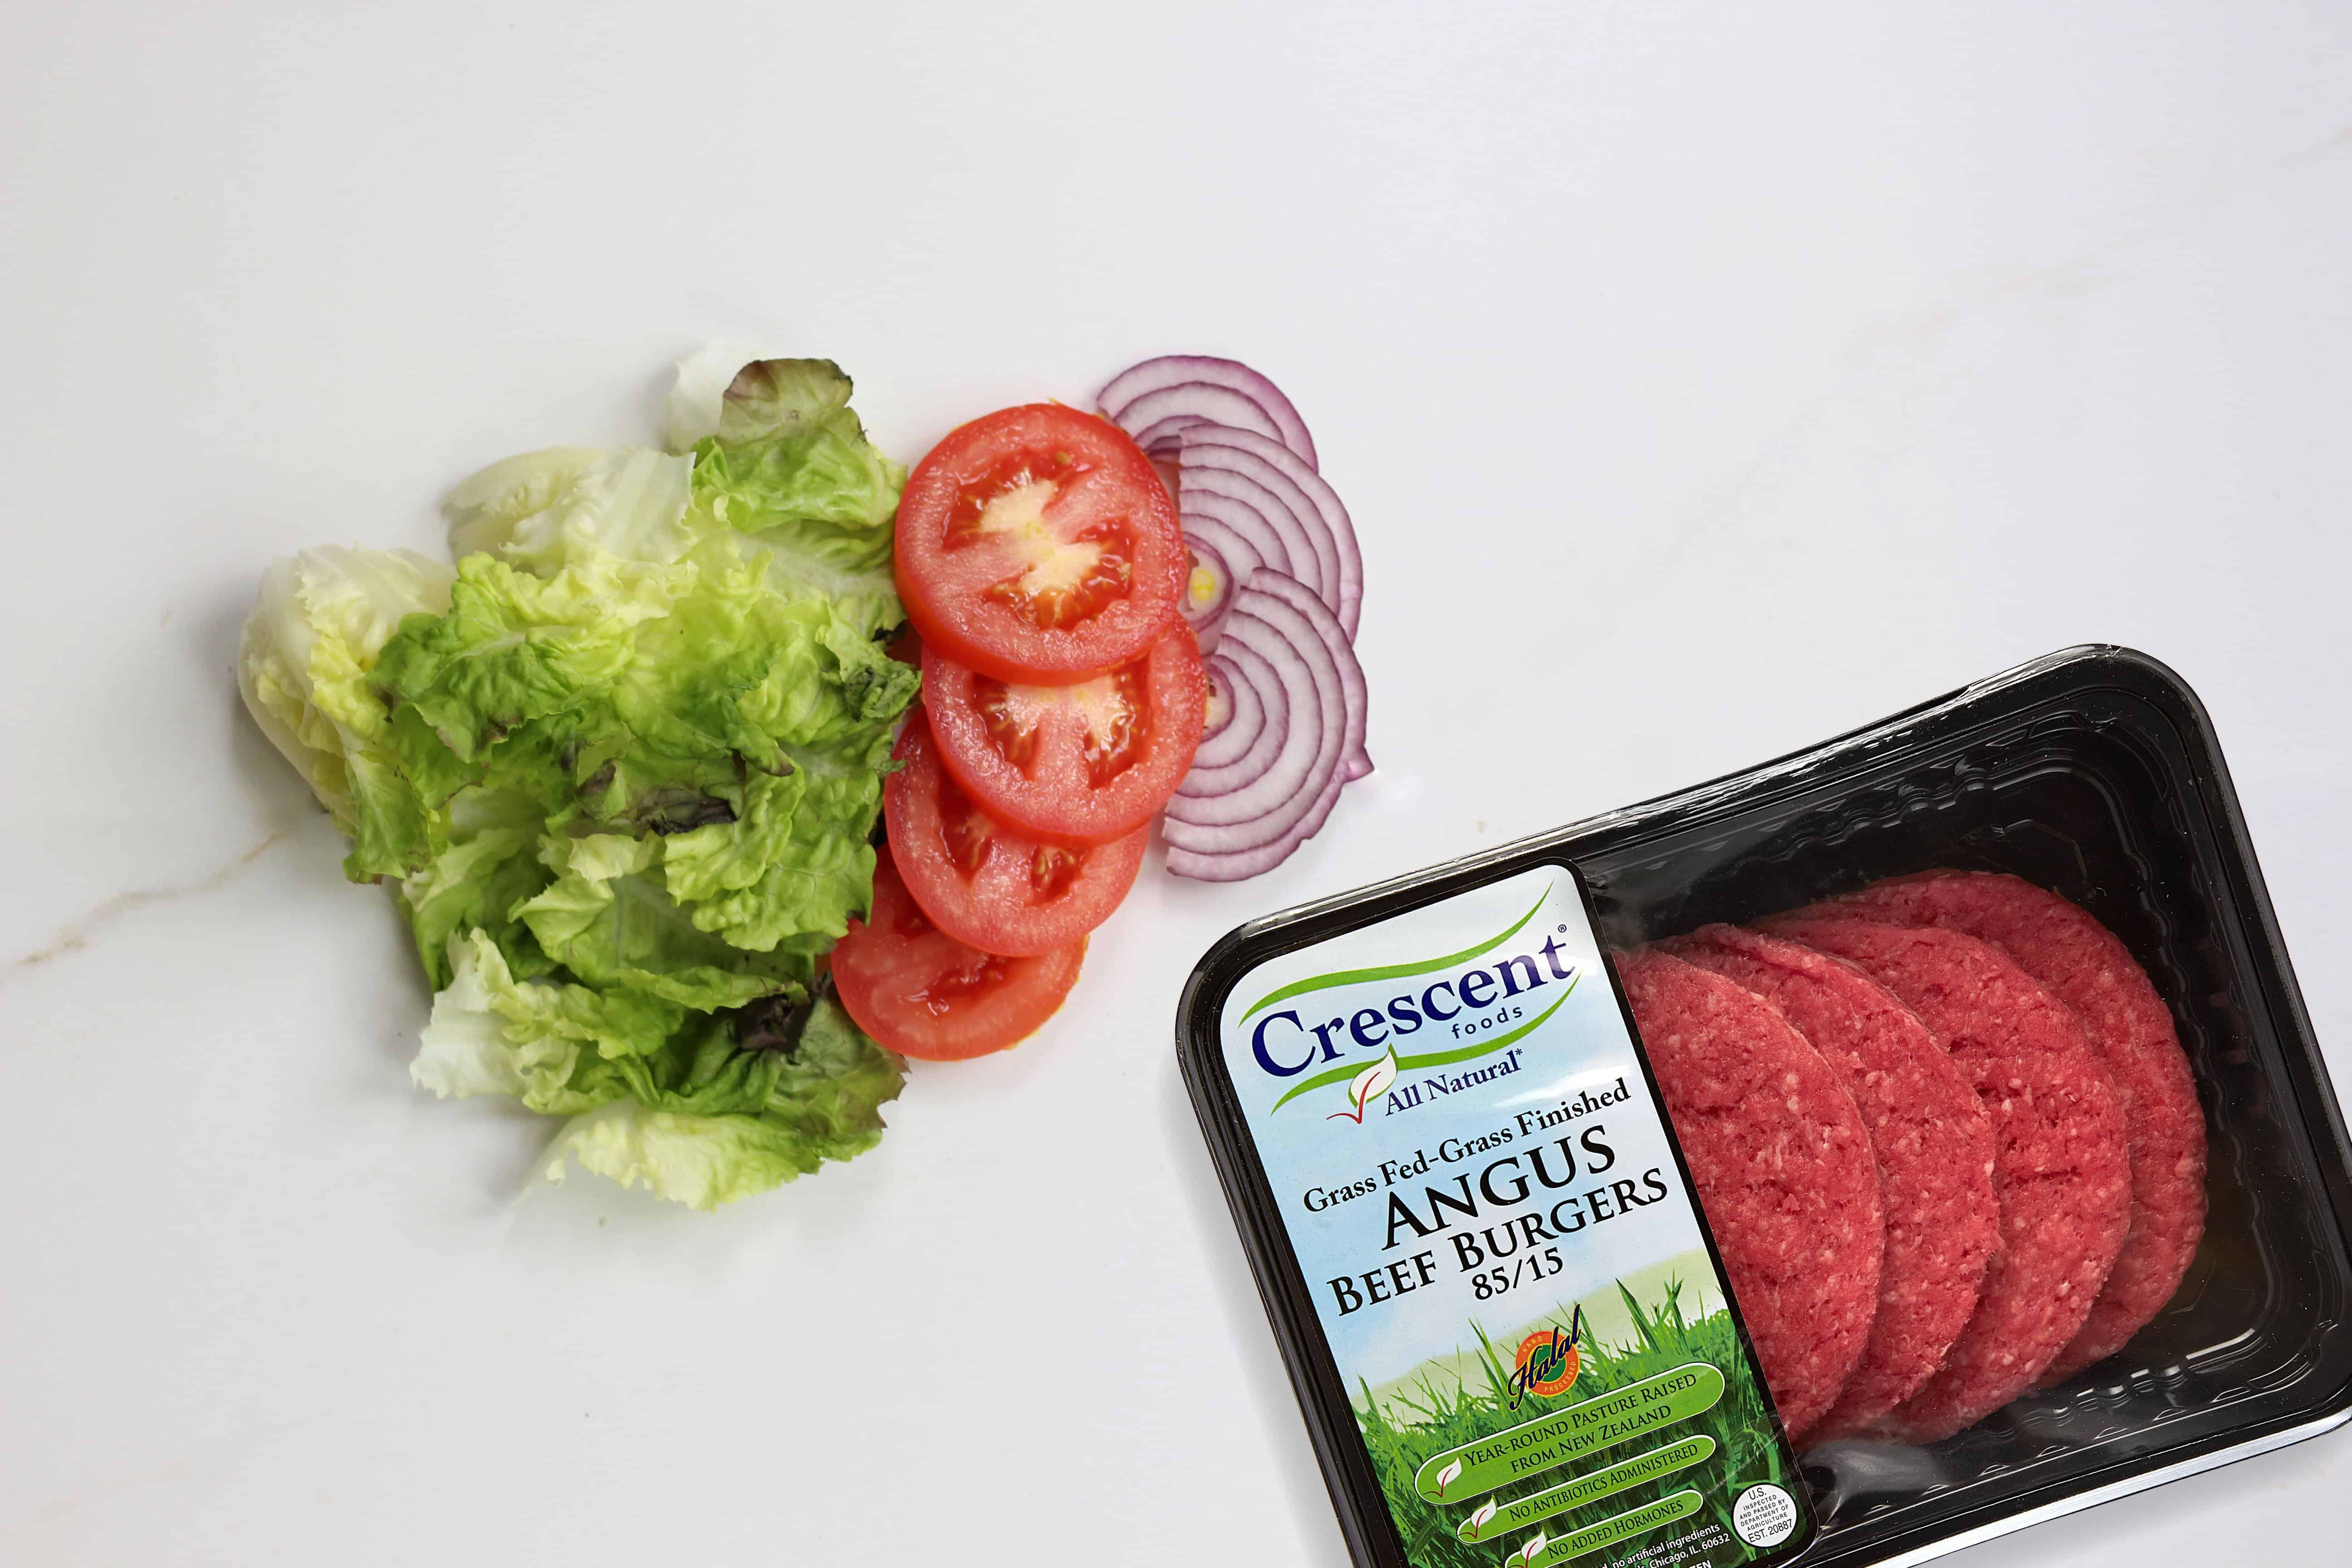 17--Lettuce-wrap-burger-Tray